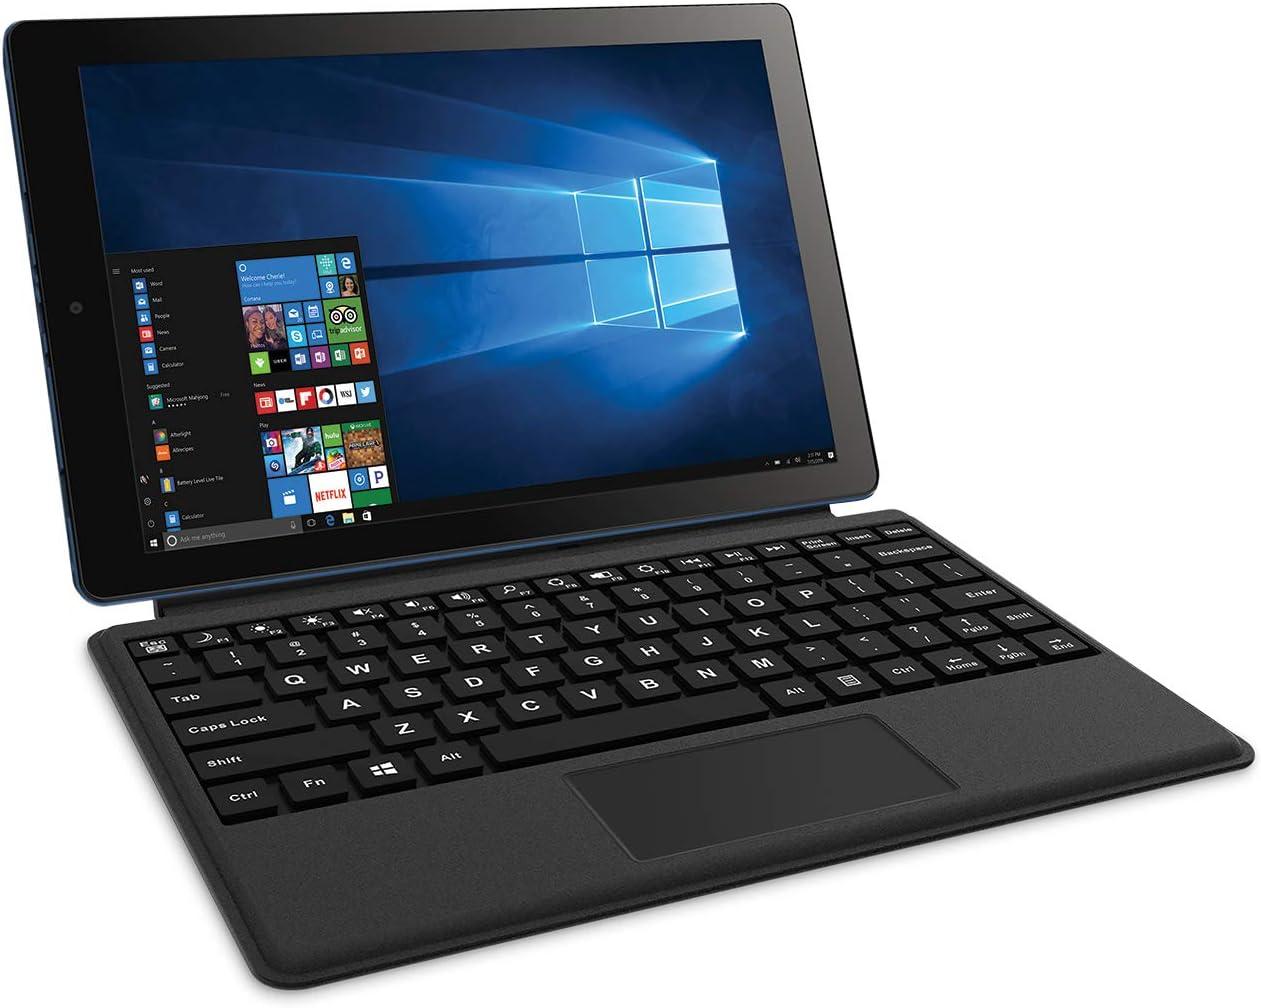 "2018 RCA Cambio High Performance 10.1"" 2-in-1 Touchscreen Tablet PC Intel Quad-Core Processor 2GB RAM 32GB Hard Drive Webcam WiFi Bluetooth Microsoft Office Mobile Windows 10"